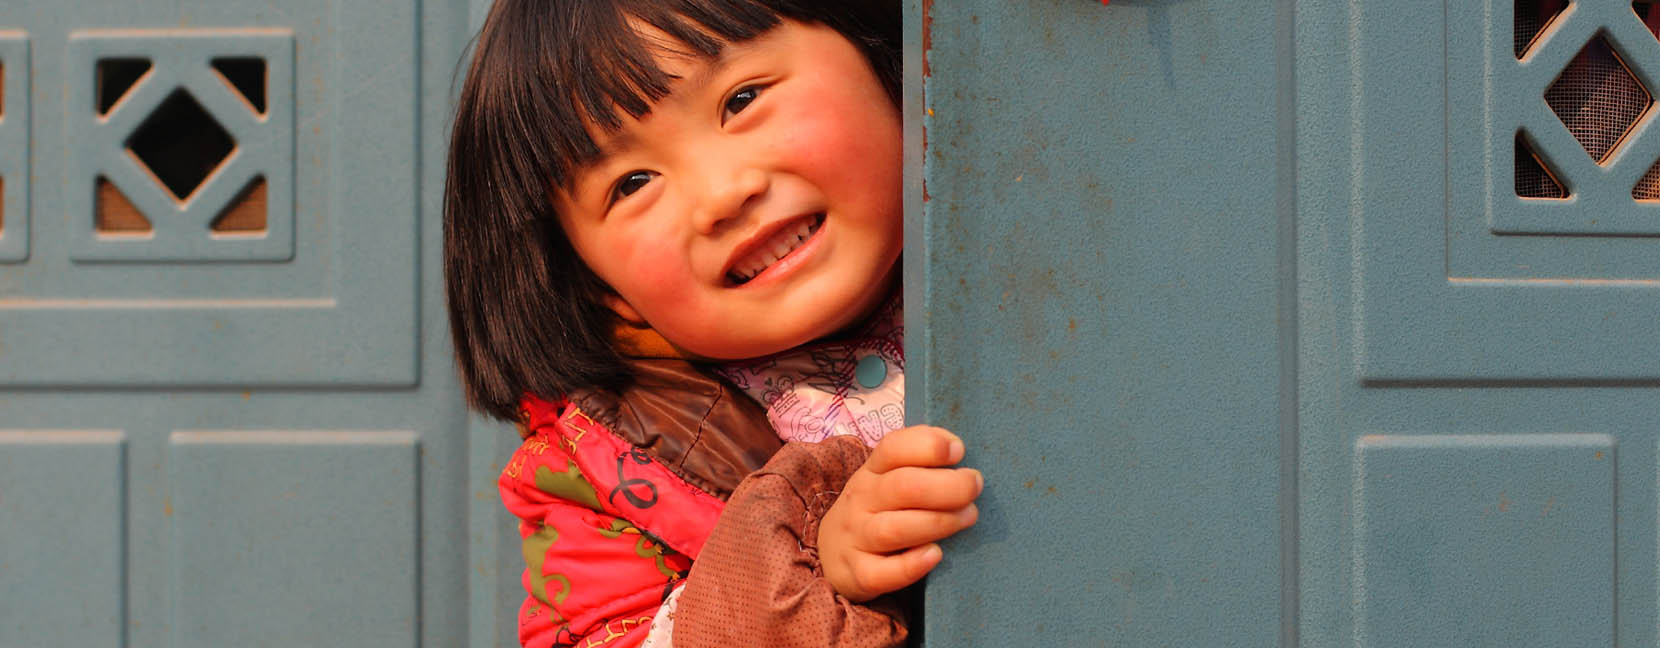 Bambina spunta nascosta dietro una porta